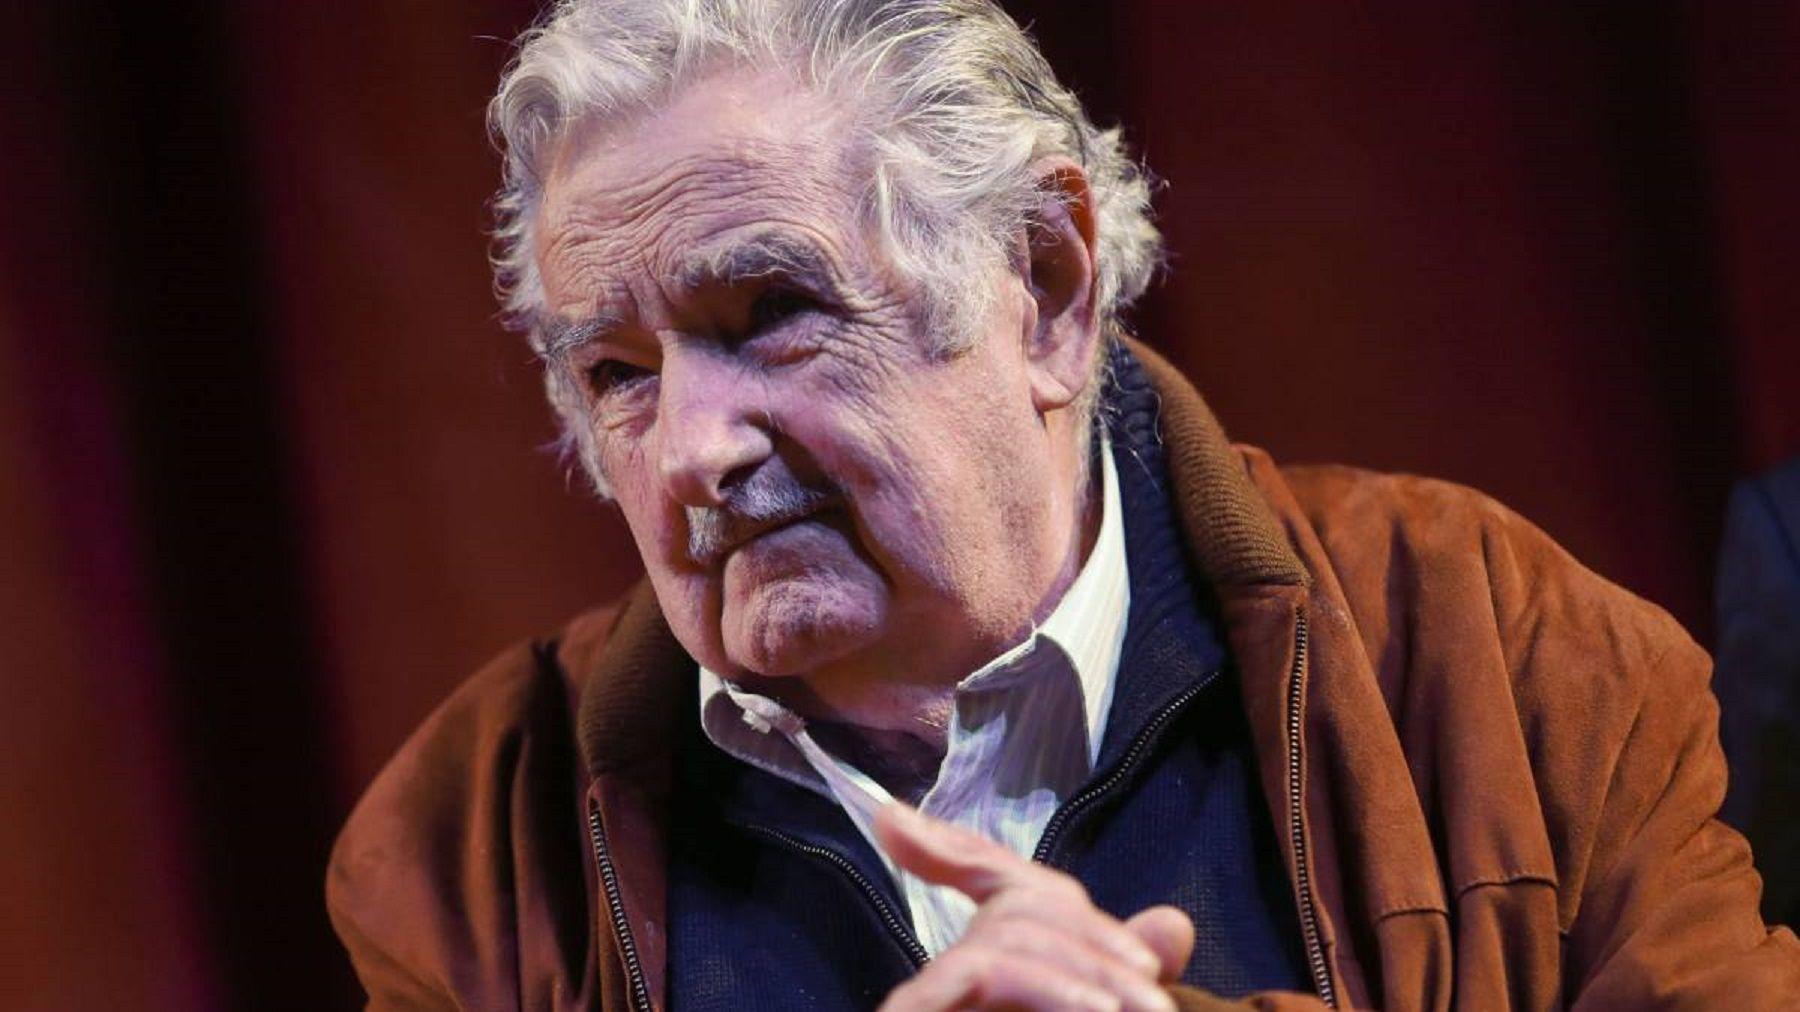 Pepe Mujica rechazó iniciativa de Lacalle Pou